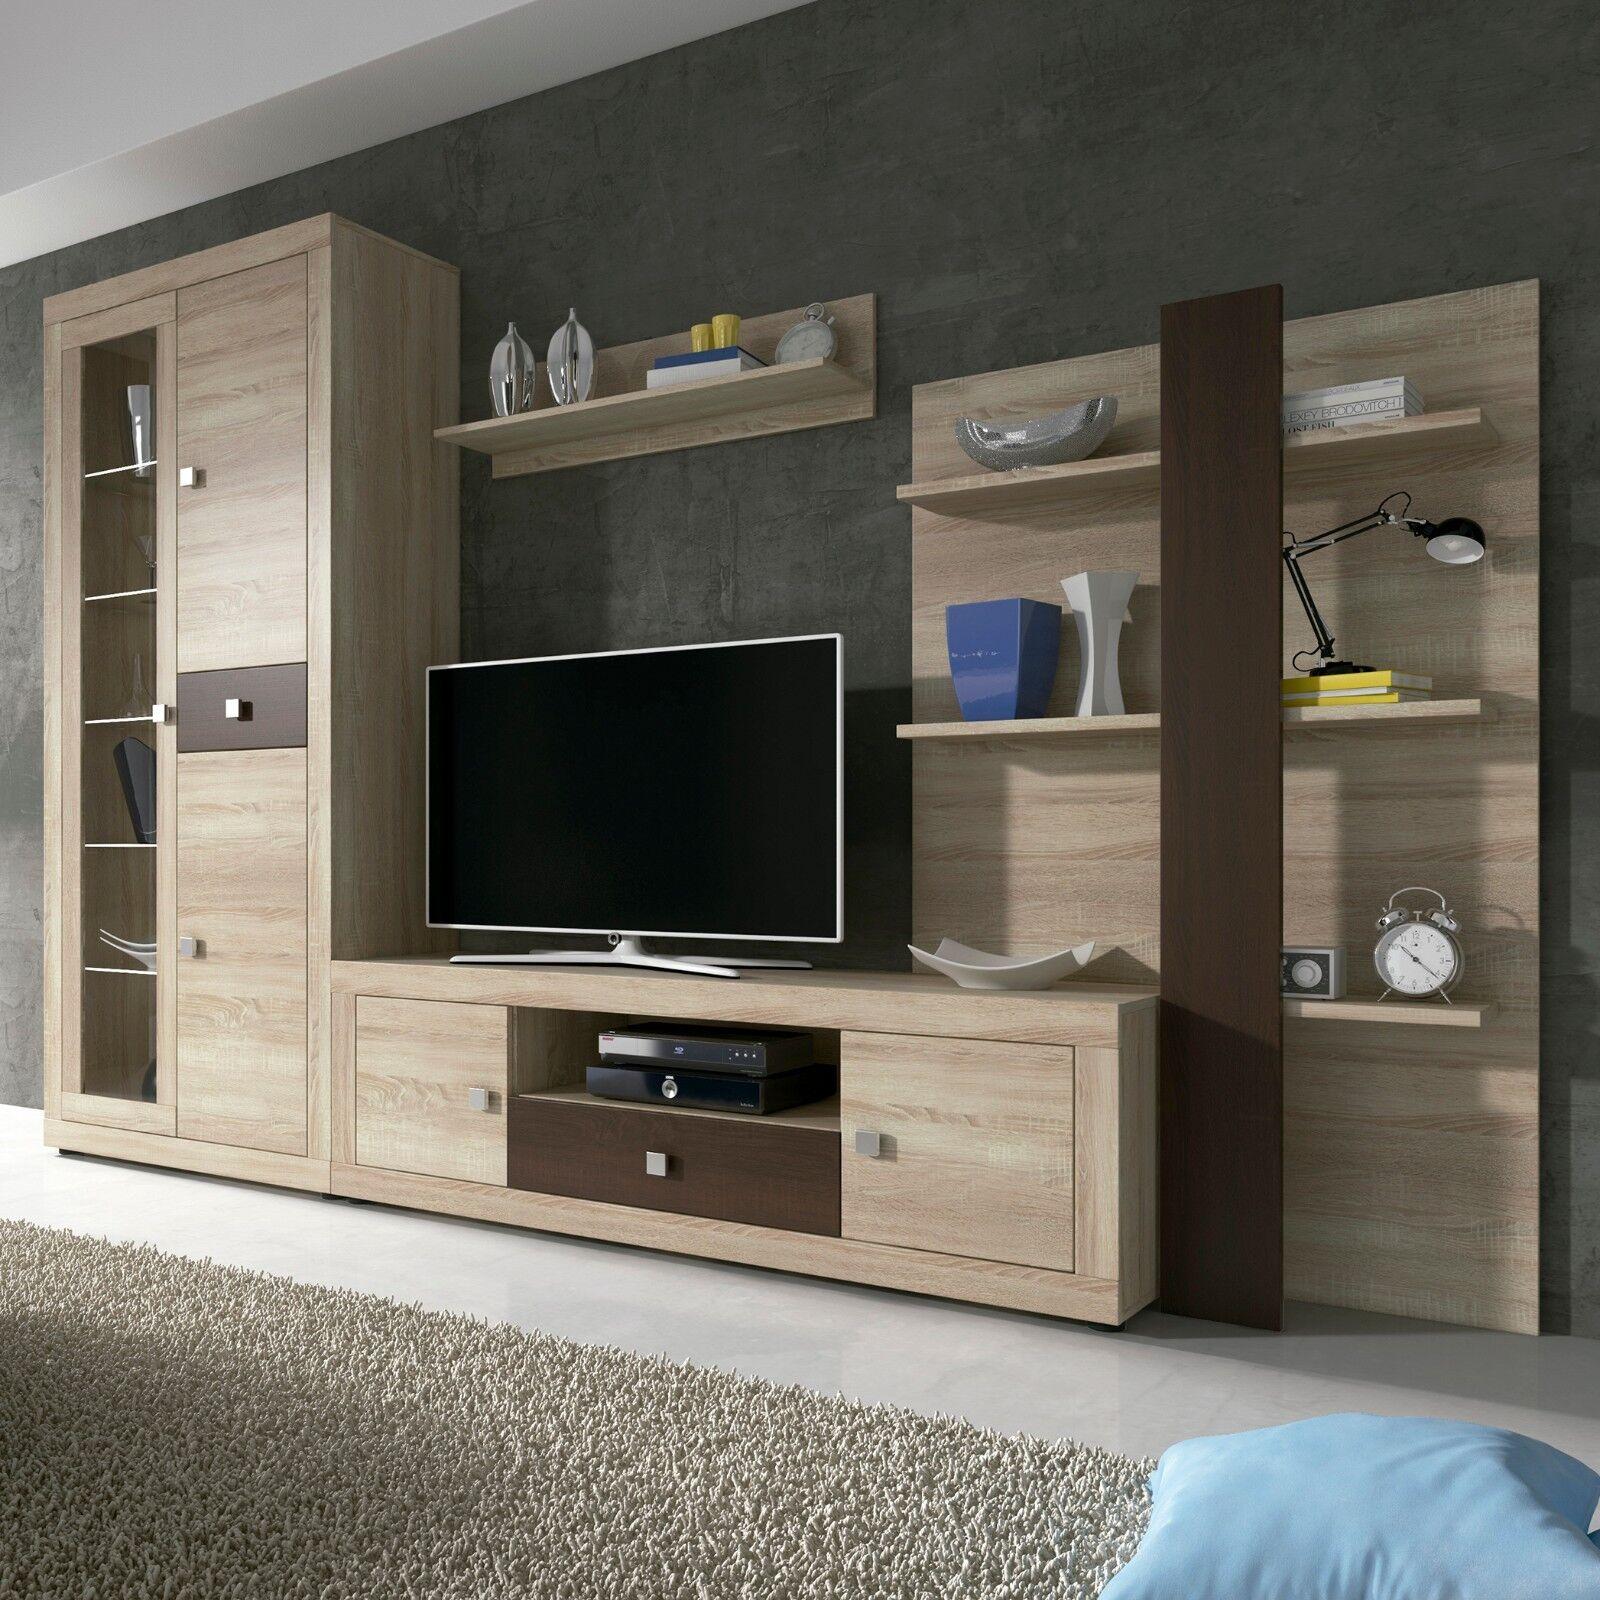 Mueble de comedor con leds, conjunto comedor salon vitrina modulo Tv ...